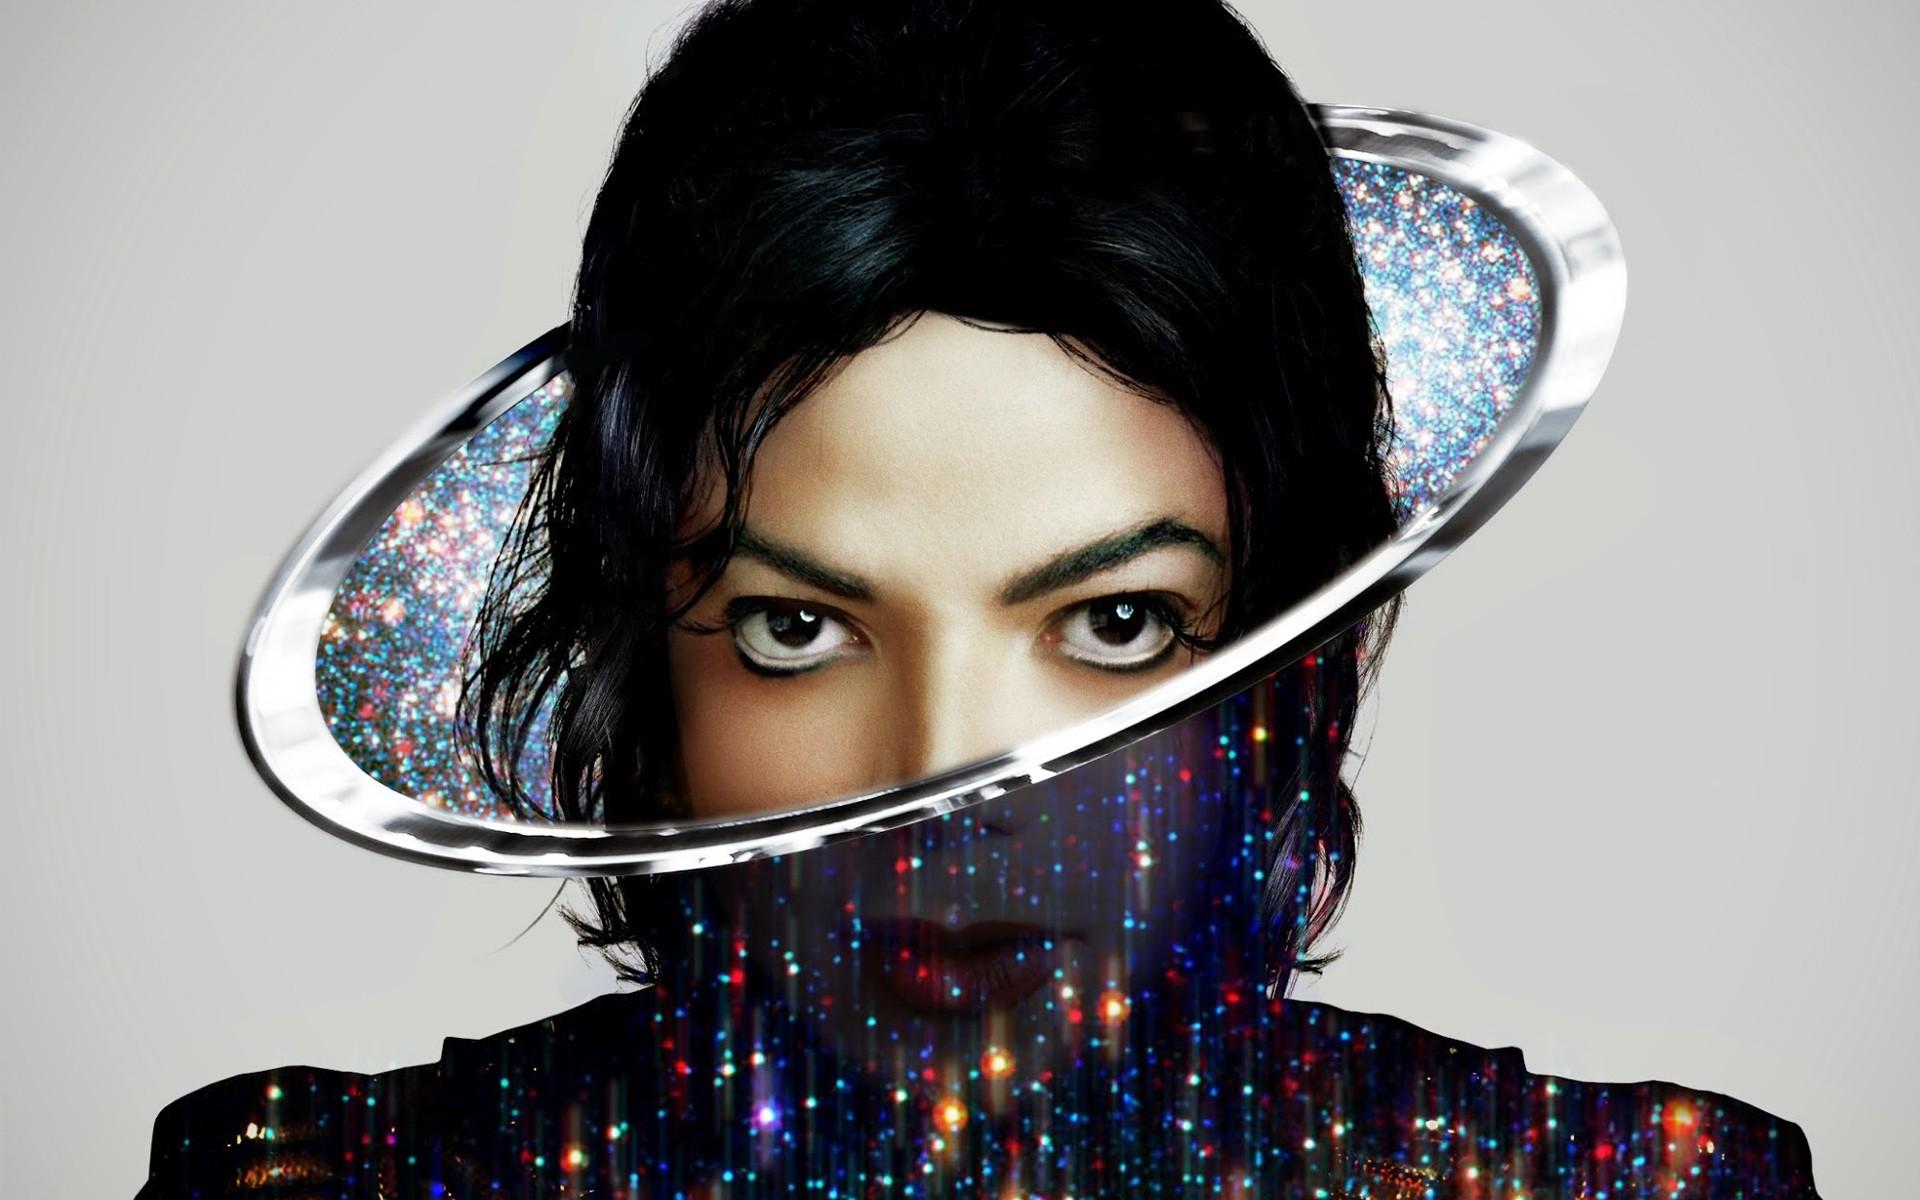 celebrities wallpaper michael jackson - photo #20